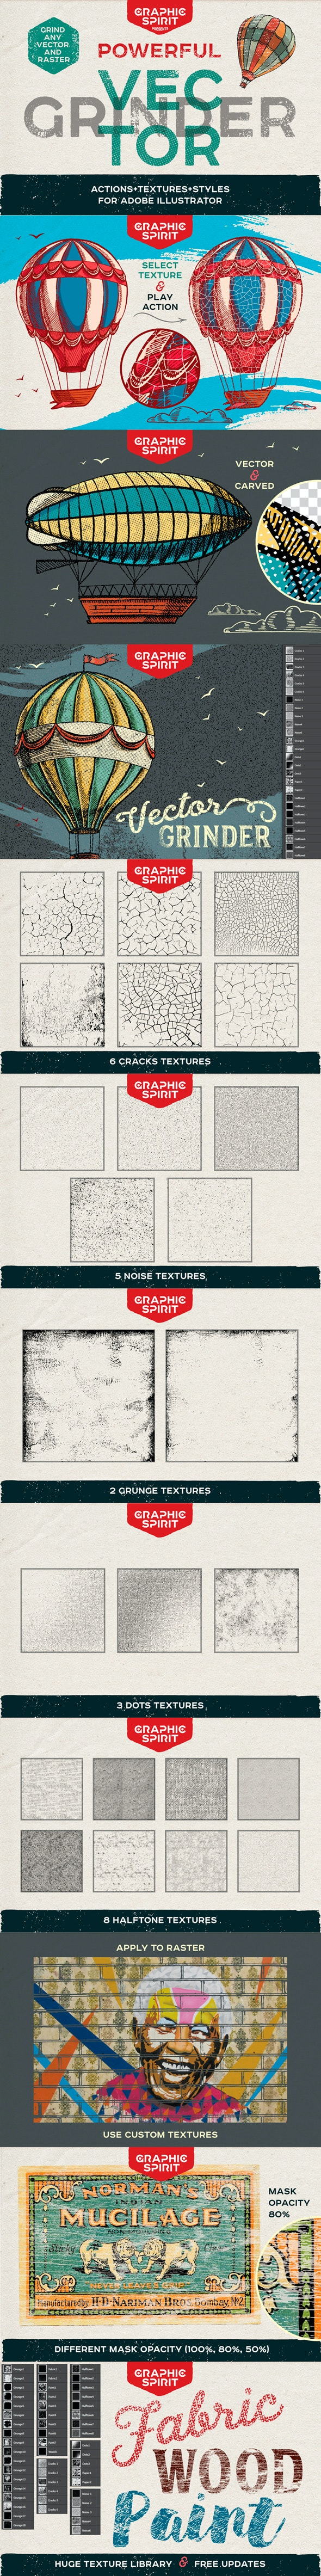 Vector Grunge Crackle Effect For Adobe Illustrator - Actions Illustrator